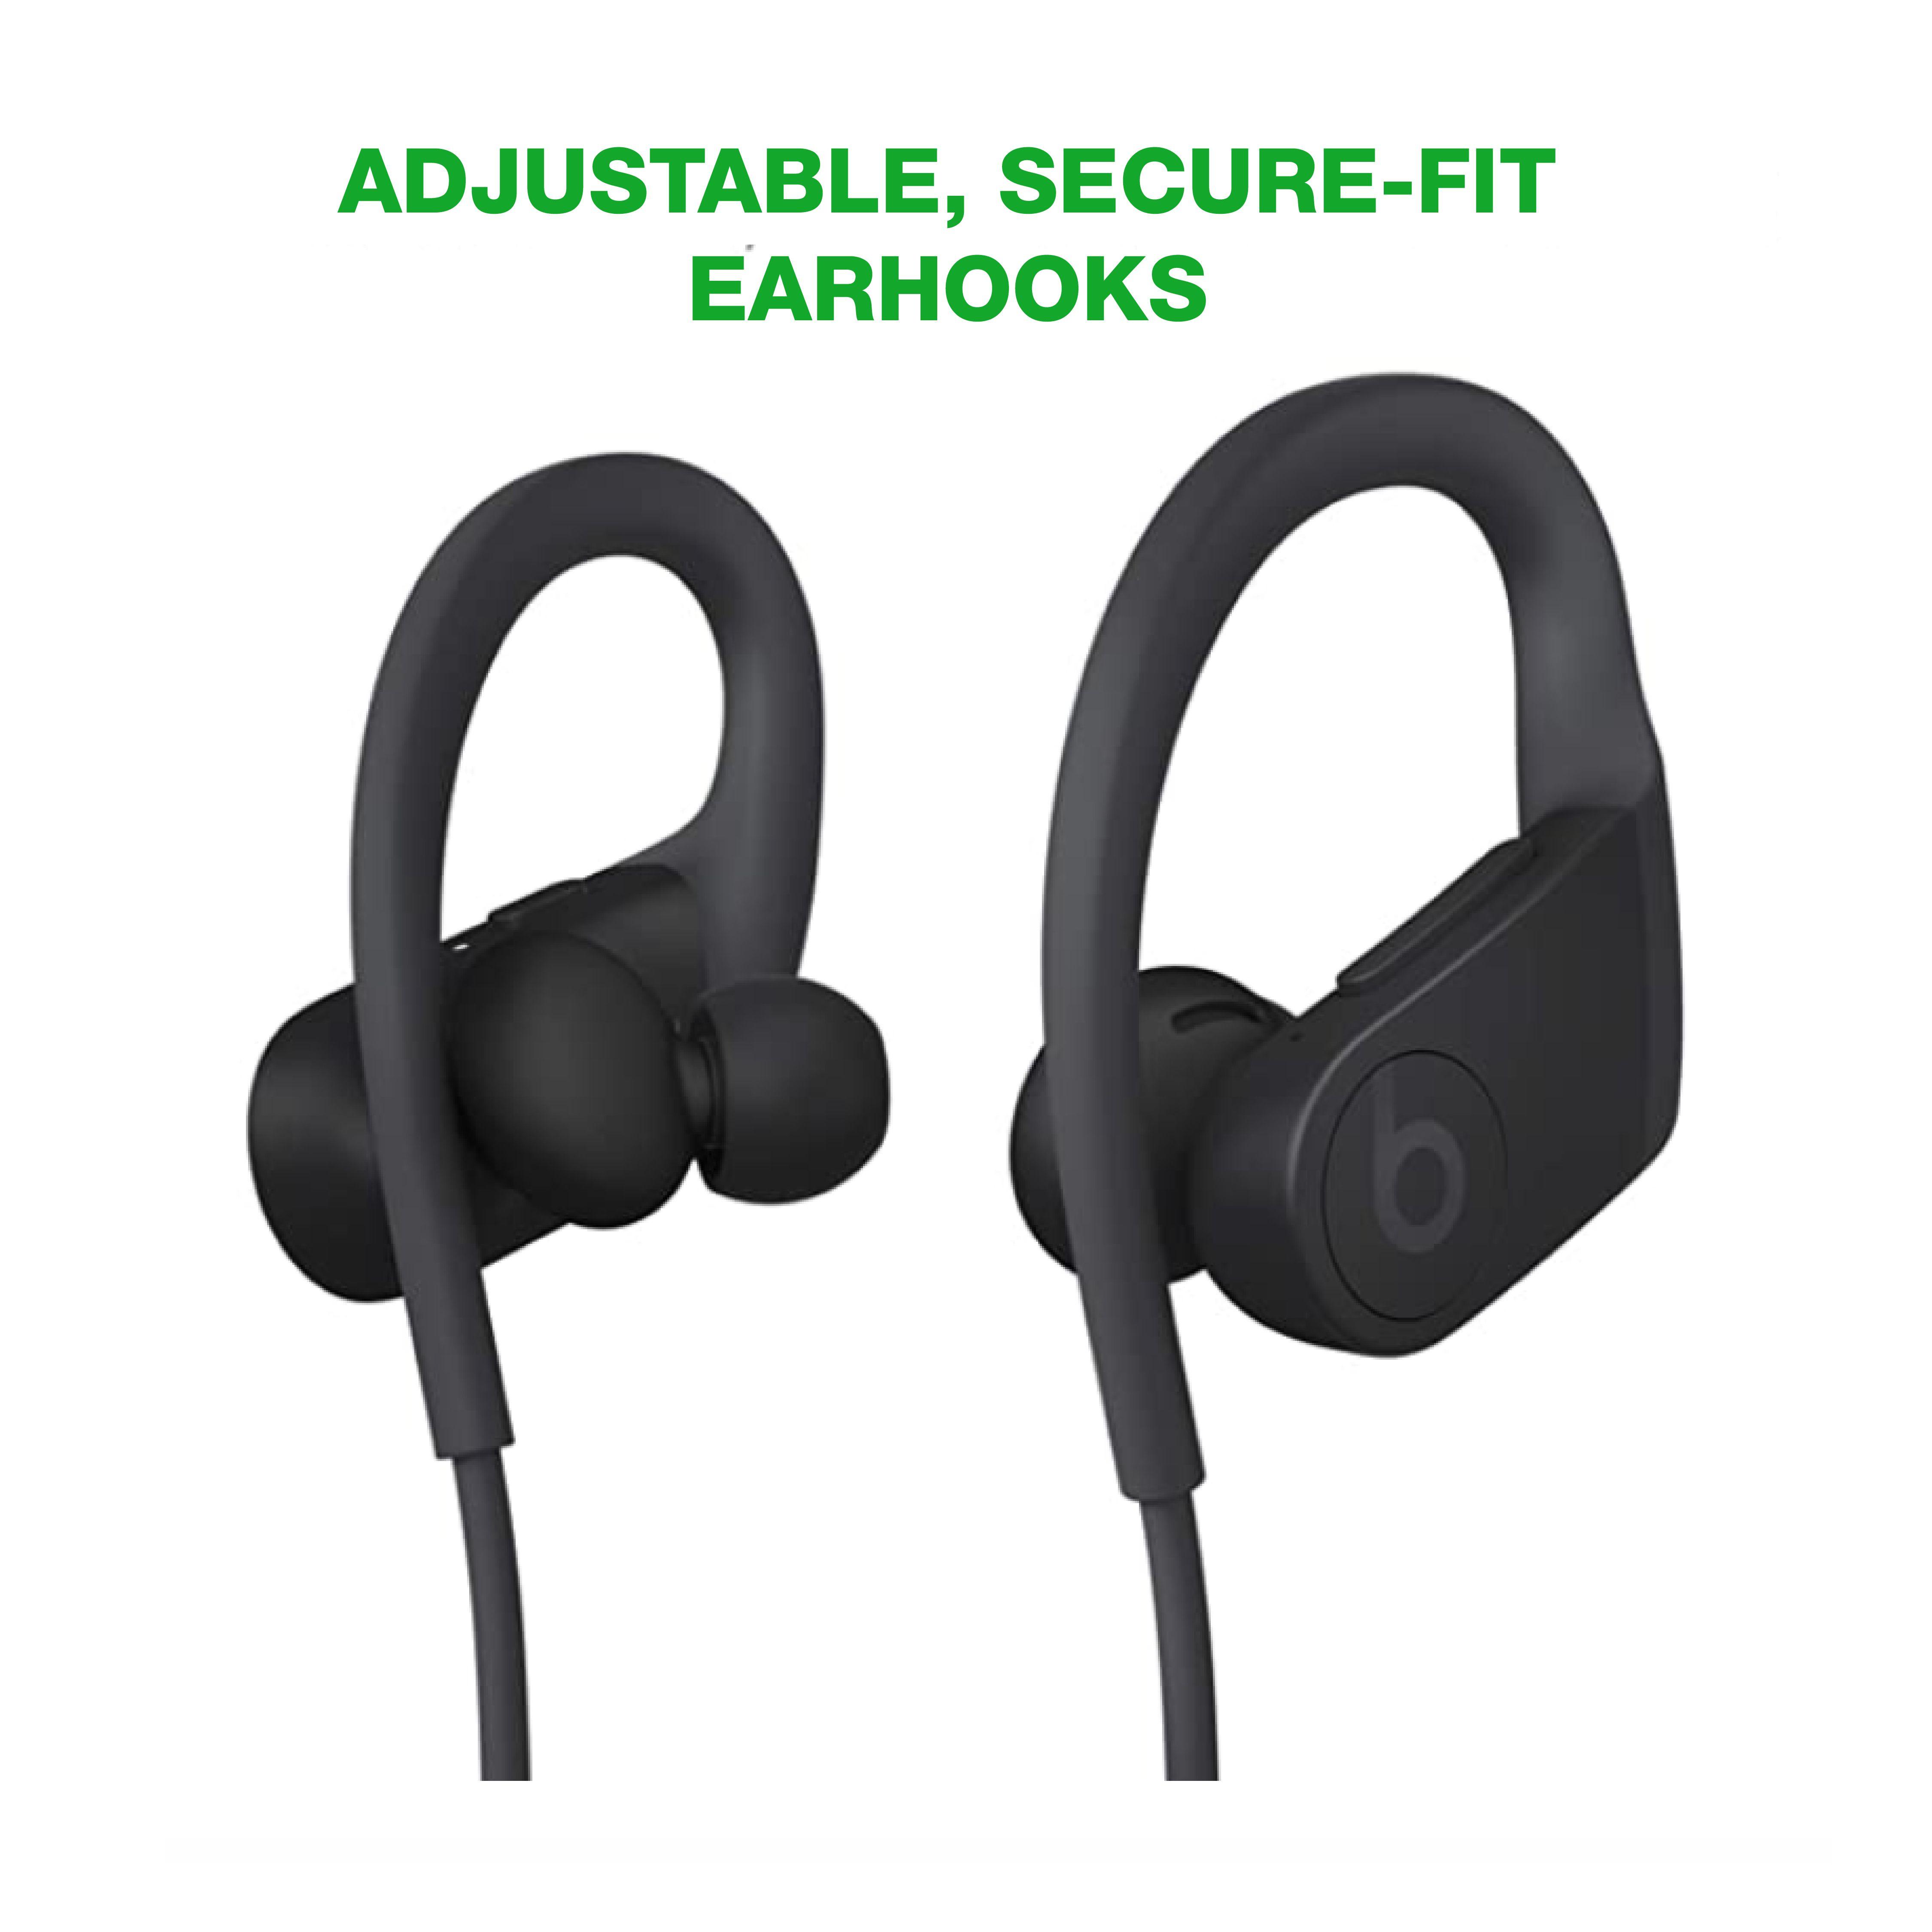 Powerbeats High Wireless Apple H1 Headphone Chip Class 1 Bluetooth 15 Hours Of Listening Time Wireless Earphones Headphone Earphone